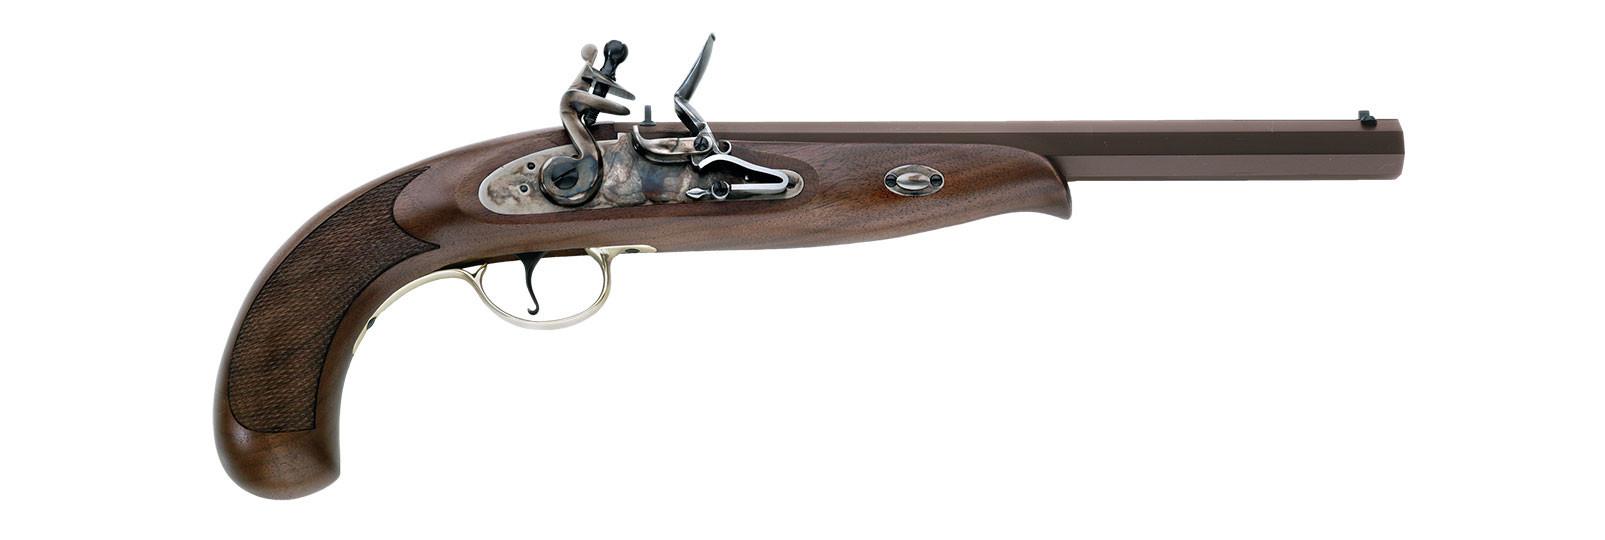 Pistola Continental Duelling a pietra focaia